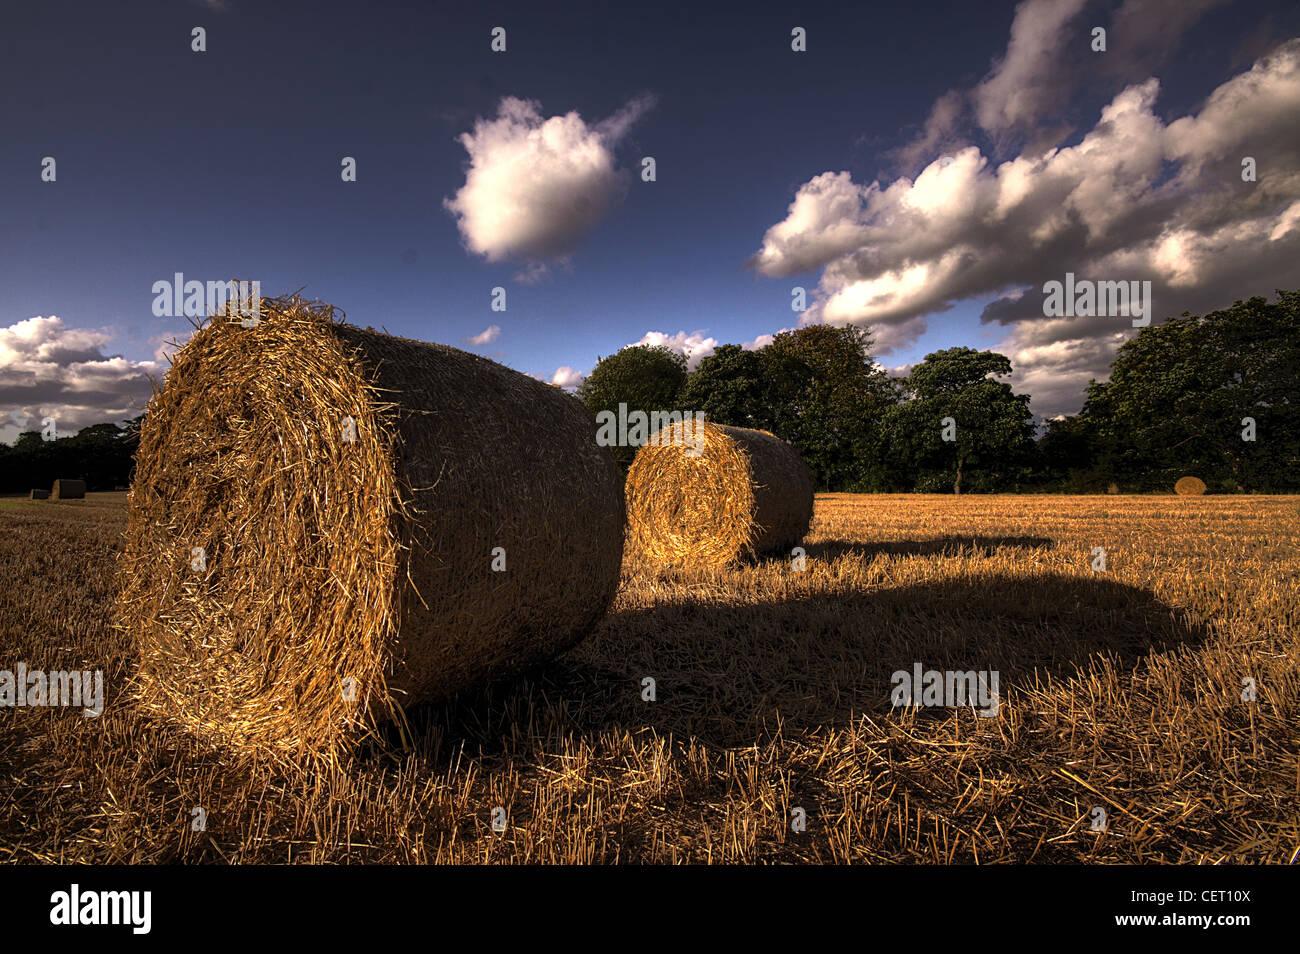 Hay Bales,Cheshire Countryside,Grappenhall,Warrington,Cheshire,WA4,2PL,WA42PL,rolls,dramatic,sky,gotonysmith,drama,balers,machine,machines,field,straw,british,GB,fodder,lush,pasture,harvest,byproduct,stacks,pits,rumination,animal,animals,making,haymaking,fodder,rick,barrack,Haylage,doing hay,or,barrack shed or barn balers silage,a bale wrapper silo endophytic fungus,gotonysmith,gotonysmith,Warringtonian,making hay,haymaking,doing hay,Buy Pictures of,Buy Images Of,Buy Pictures of,Buy Images Of